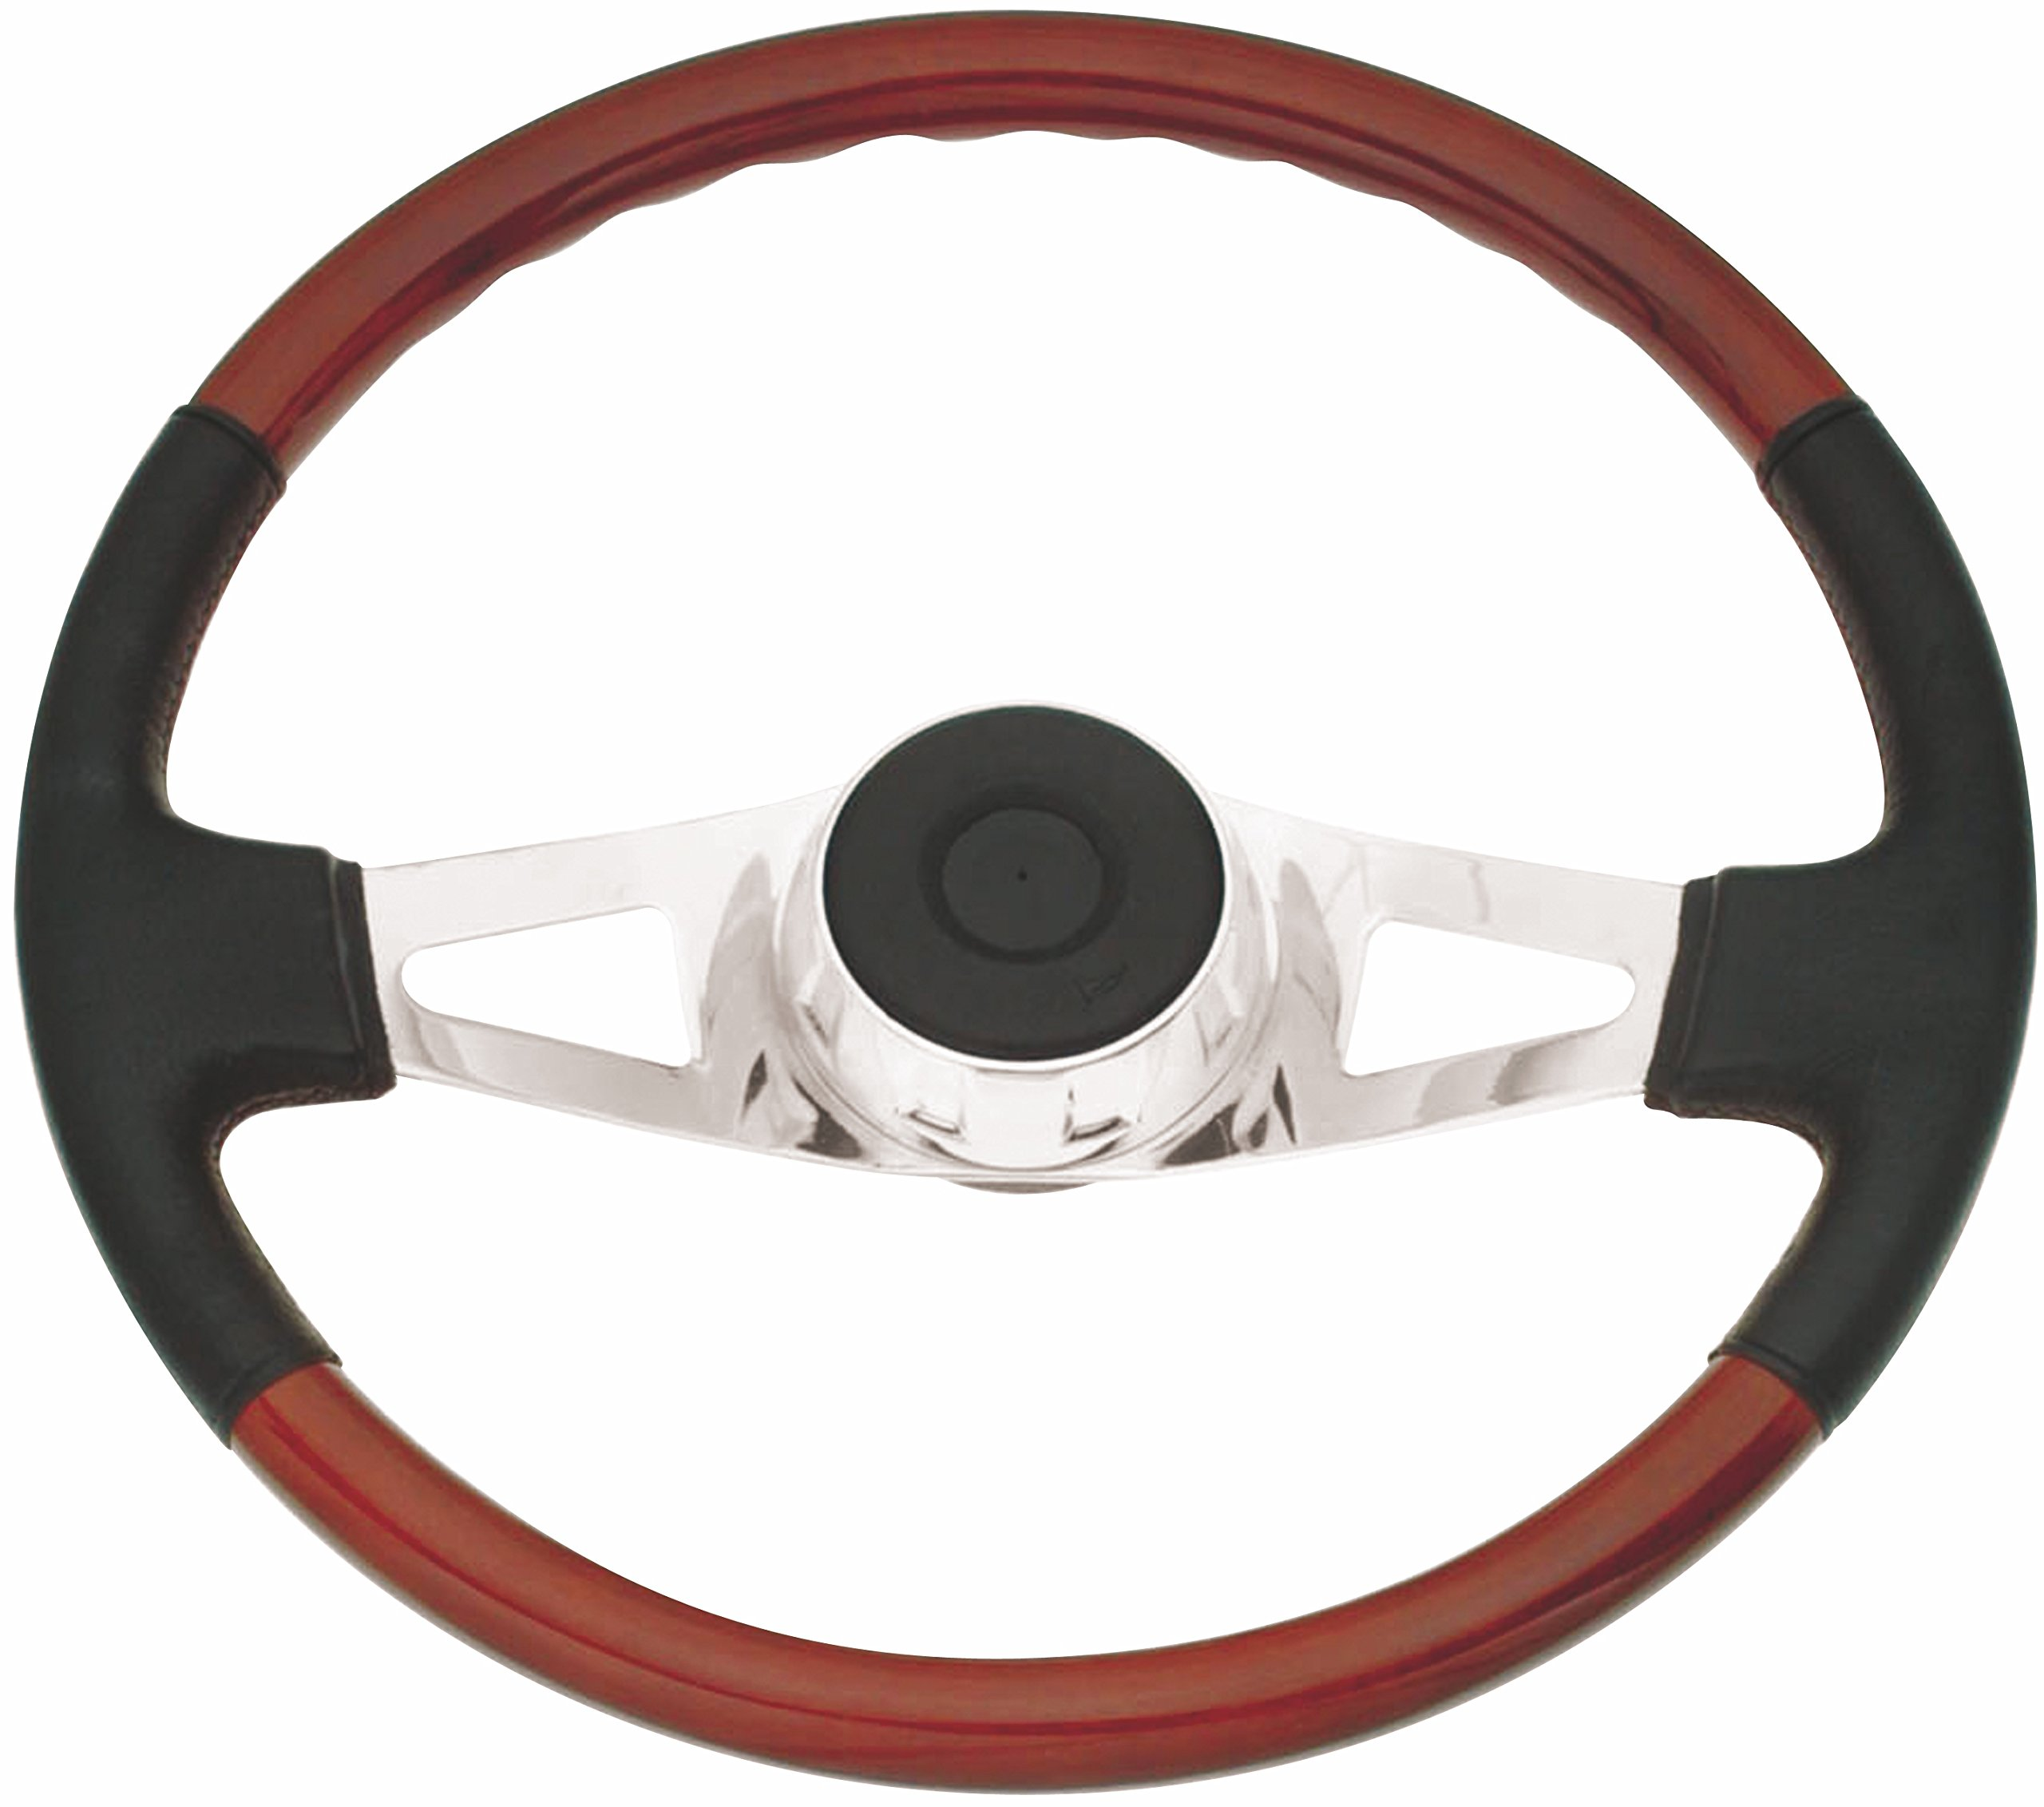 Woody's WP-SWF8901L.2 Rosewood Chrome Truck Steering Wheel (Beautiful African Hardwood)